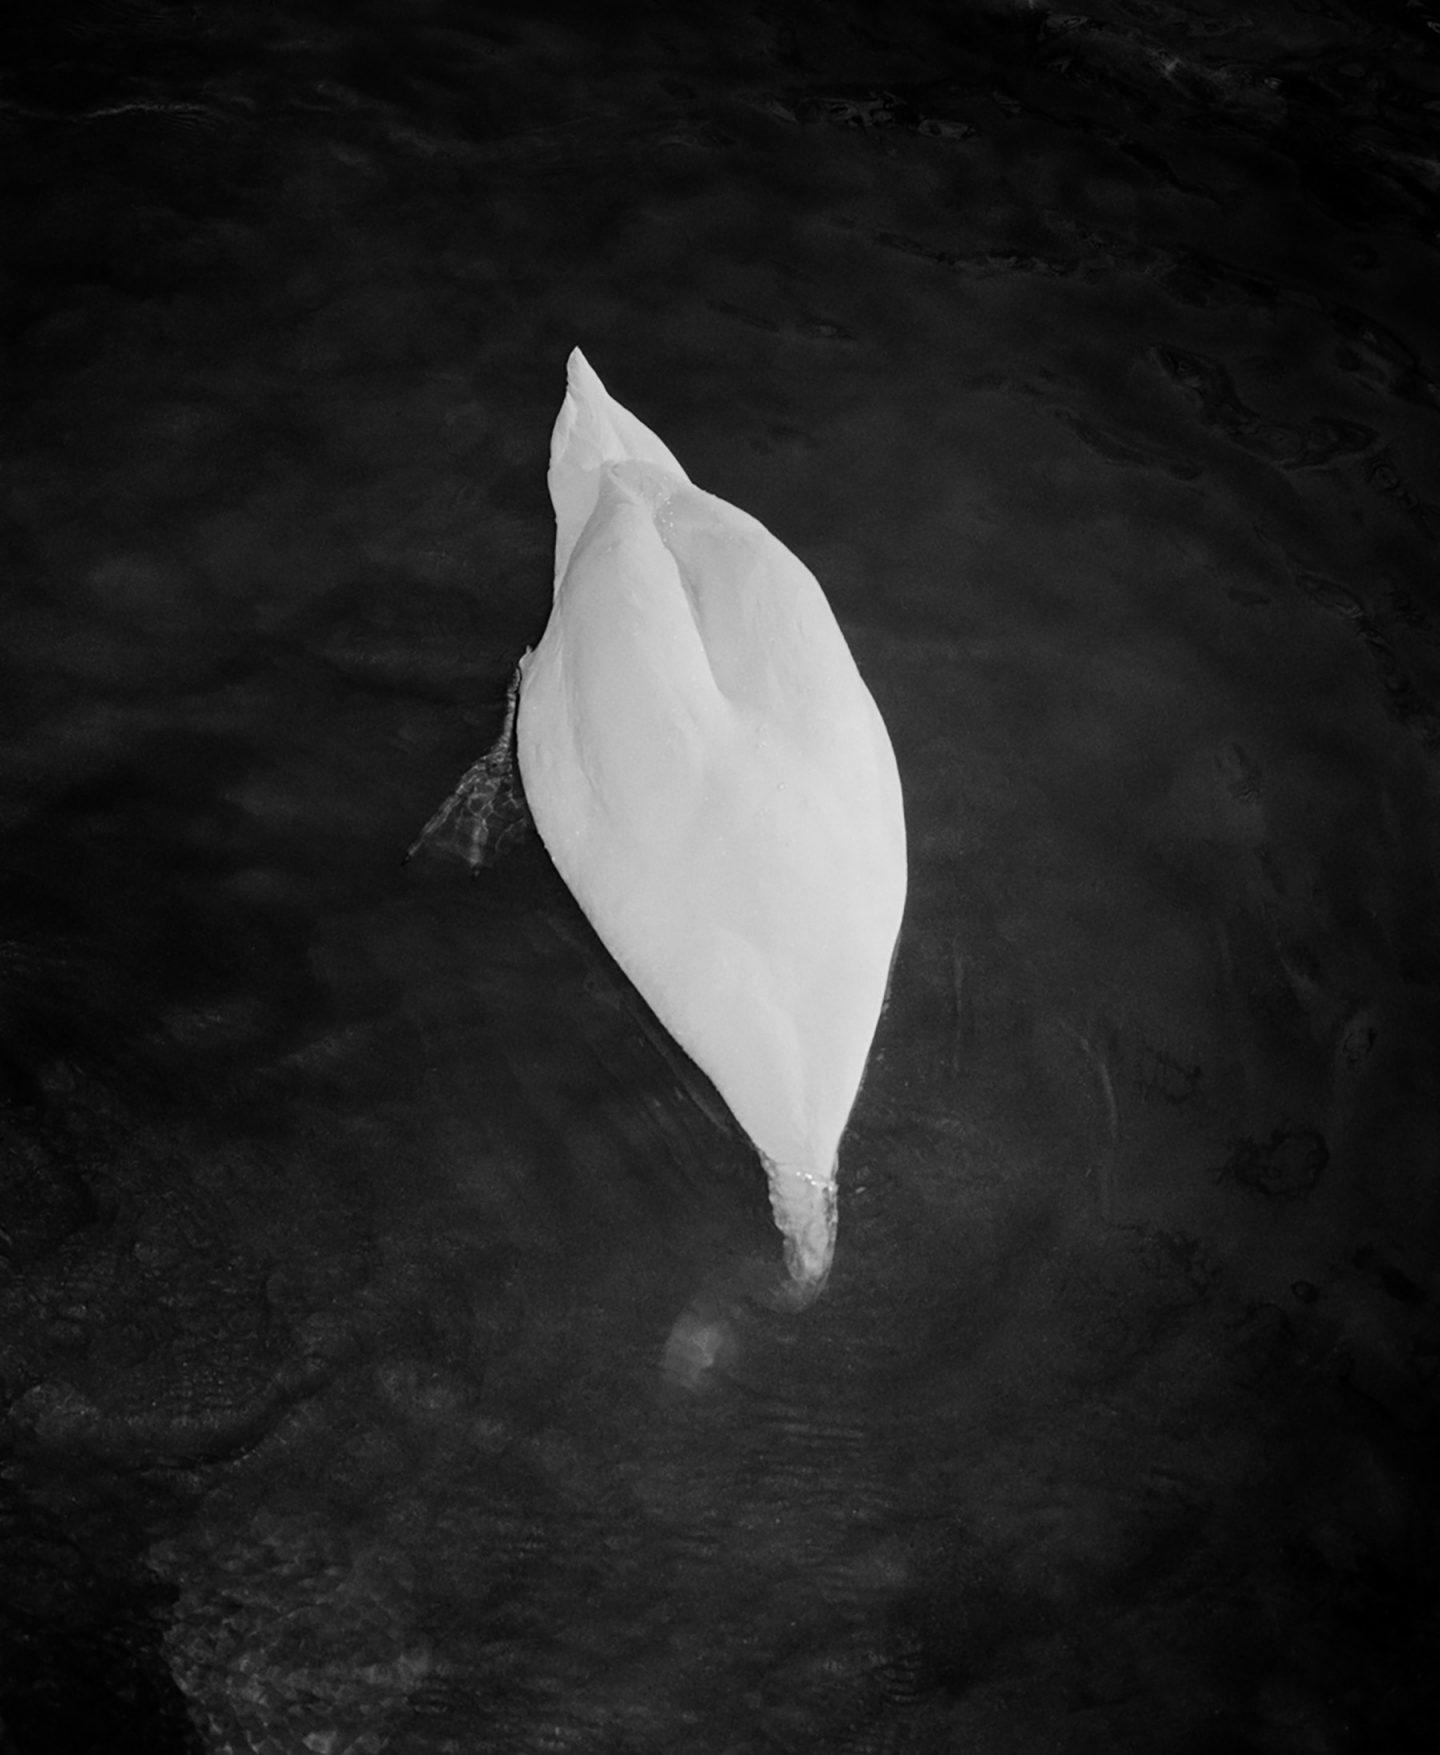 iGNANT-Photography-Matt-Eich-01